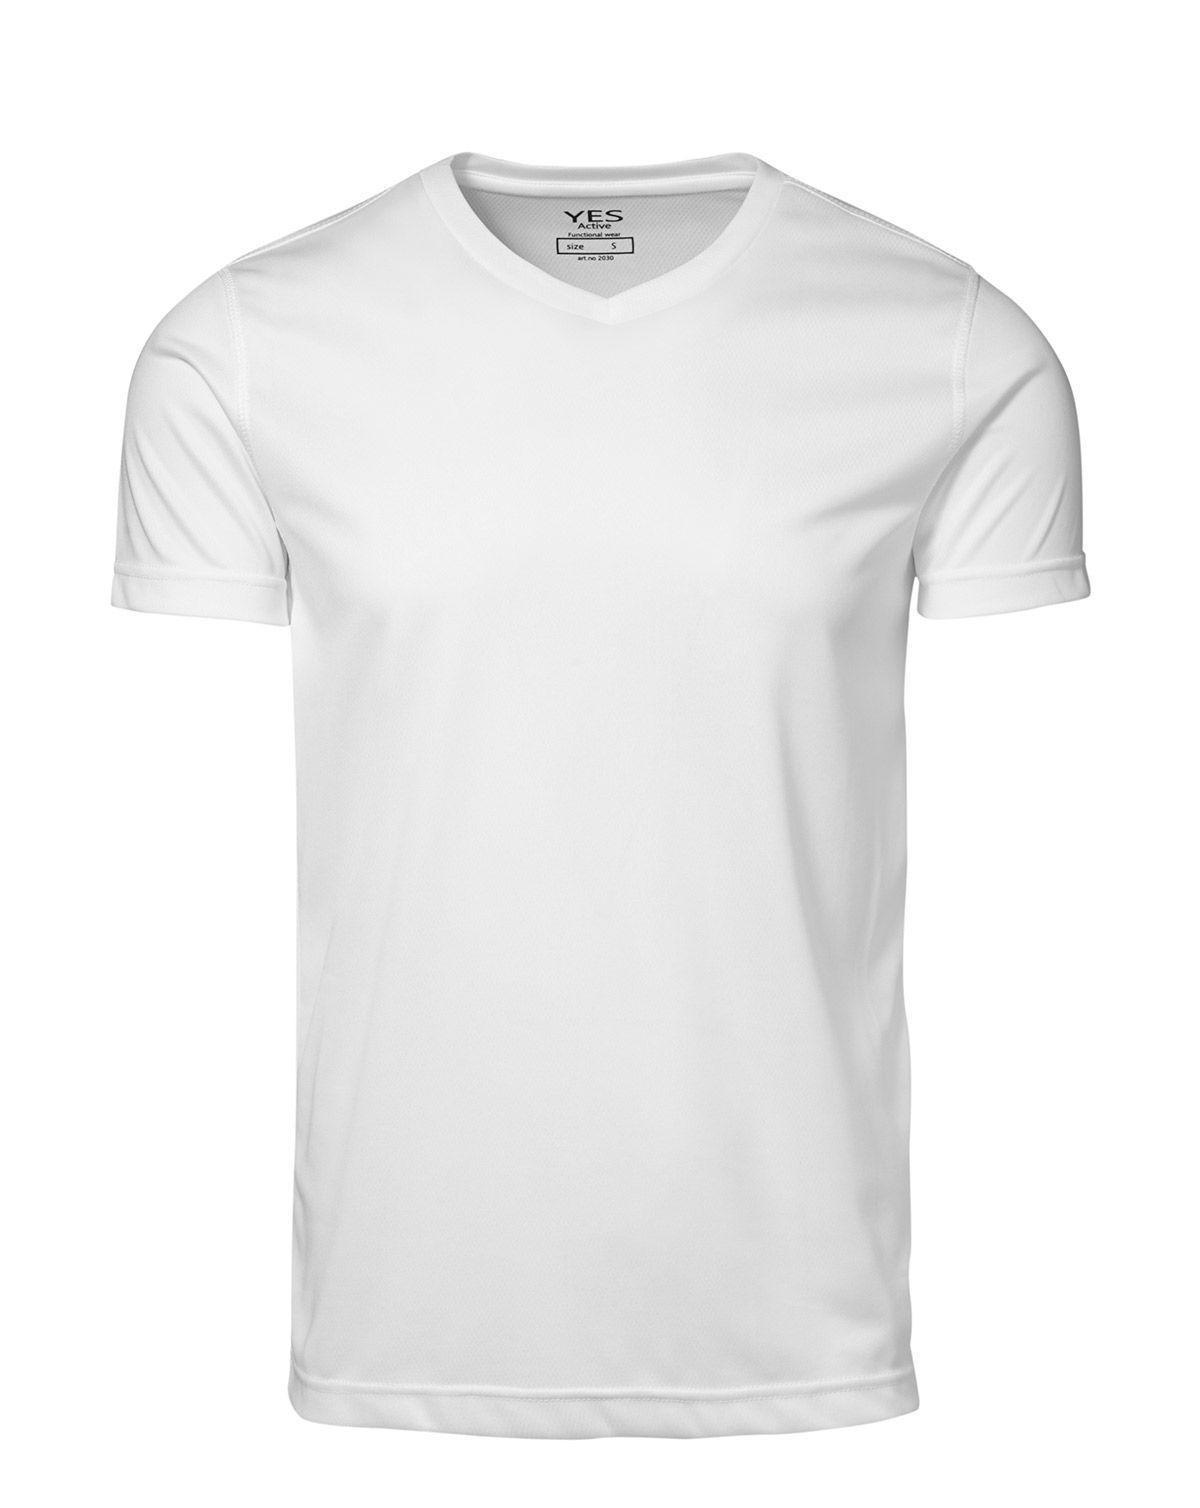 ID YES Svedtransporterende T-shirt (Hvid, 2XL)